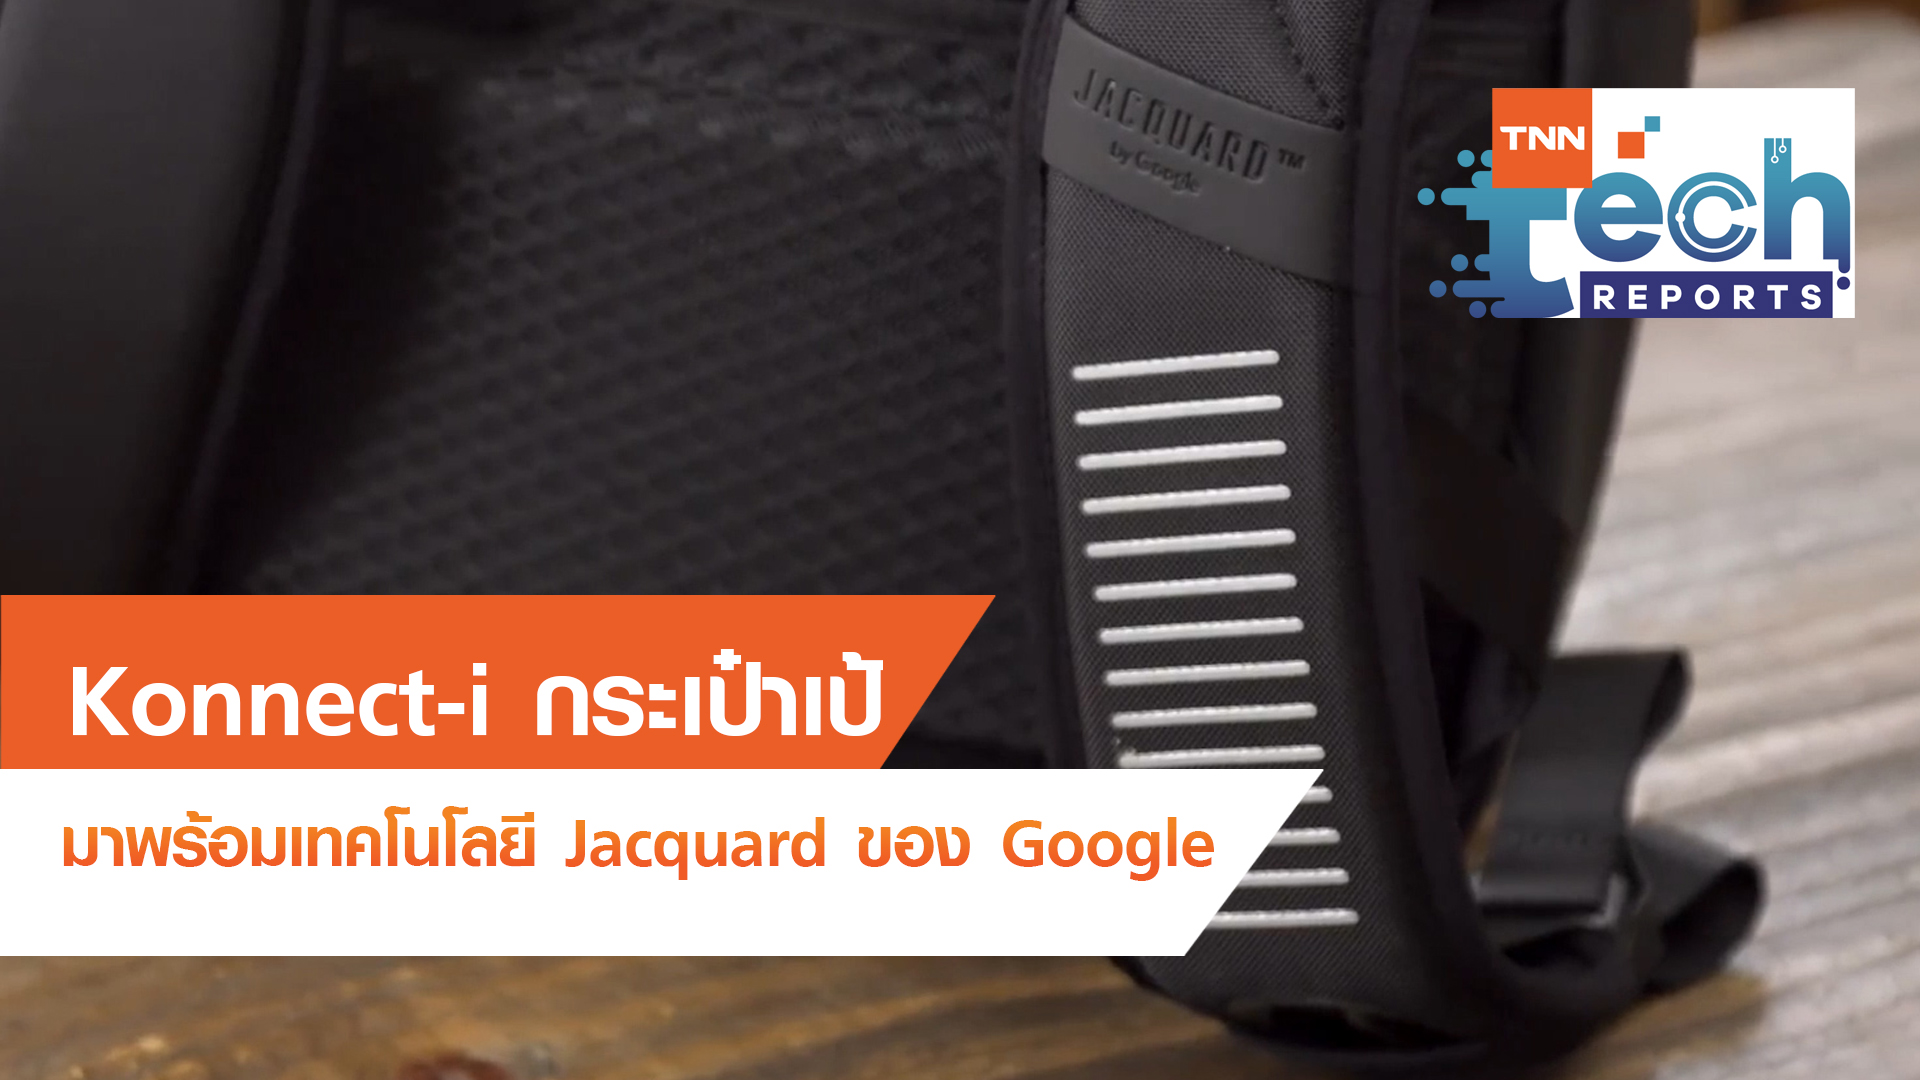 Konnect-i กระเป๋าเป้มาพร้อมเทคโนโลยี Jacquard ของ Google | TNN Tech Reports EP 7 | 13 ต.ค. 63